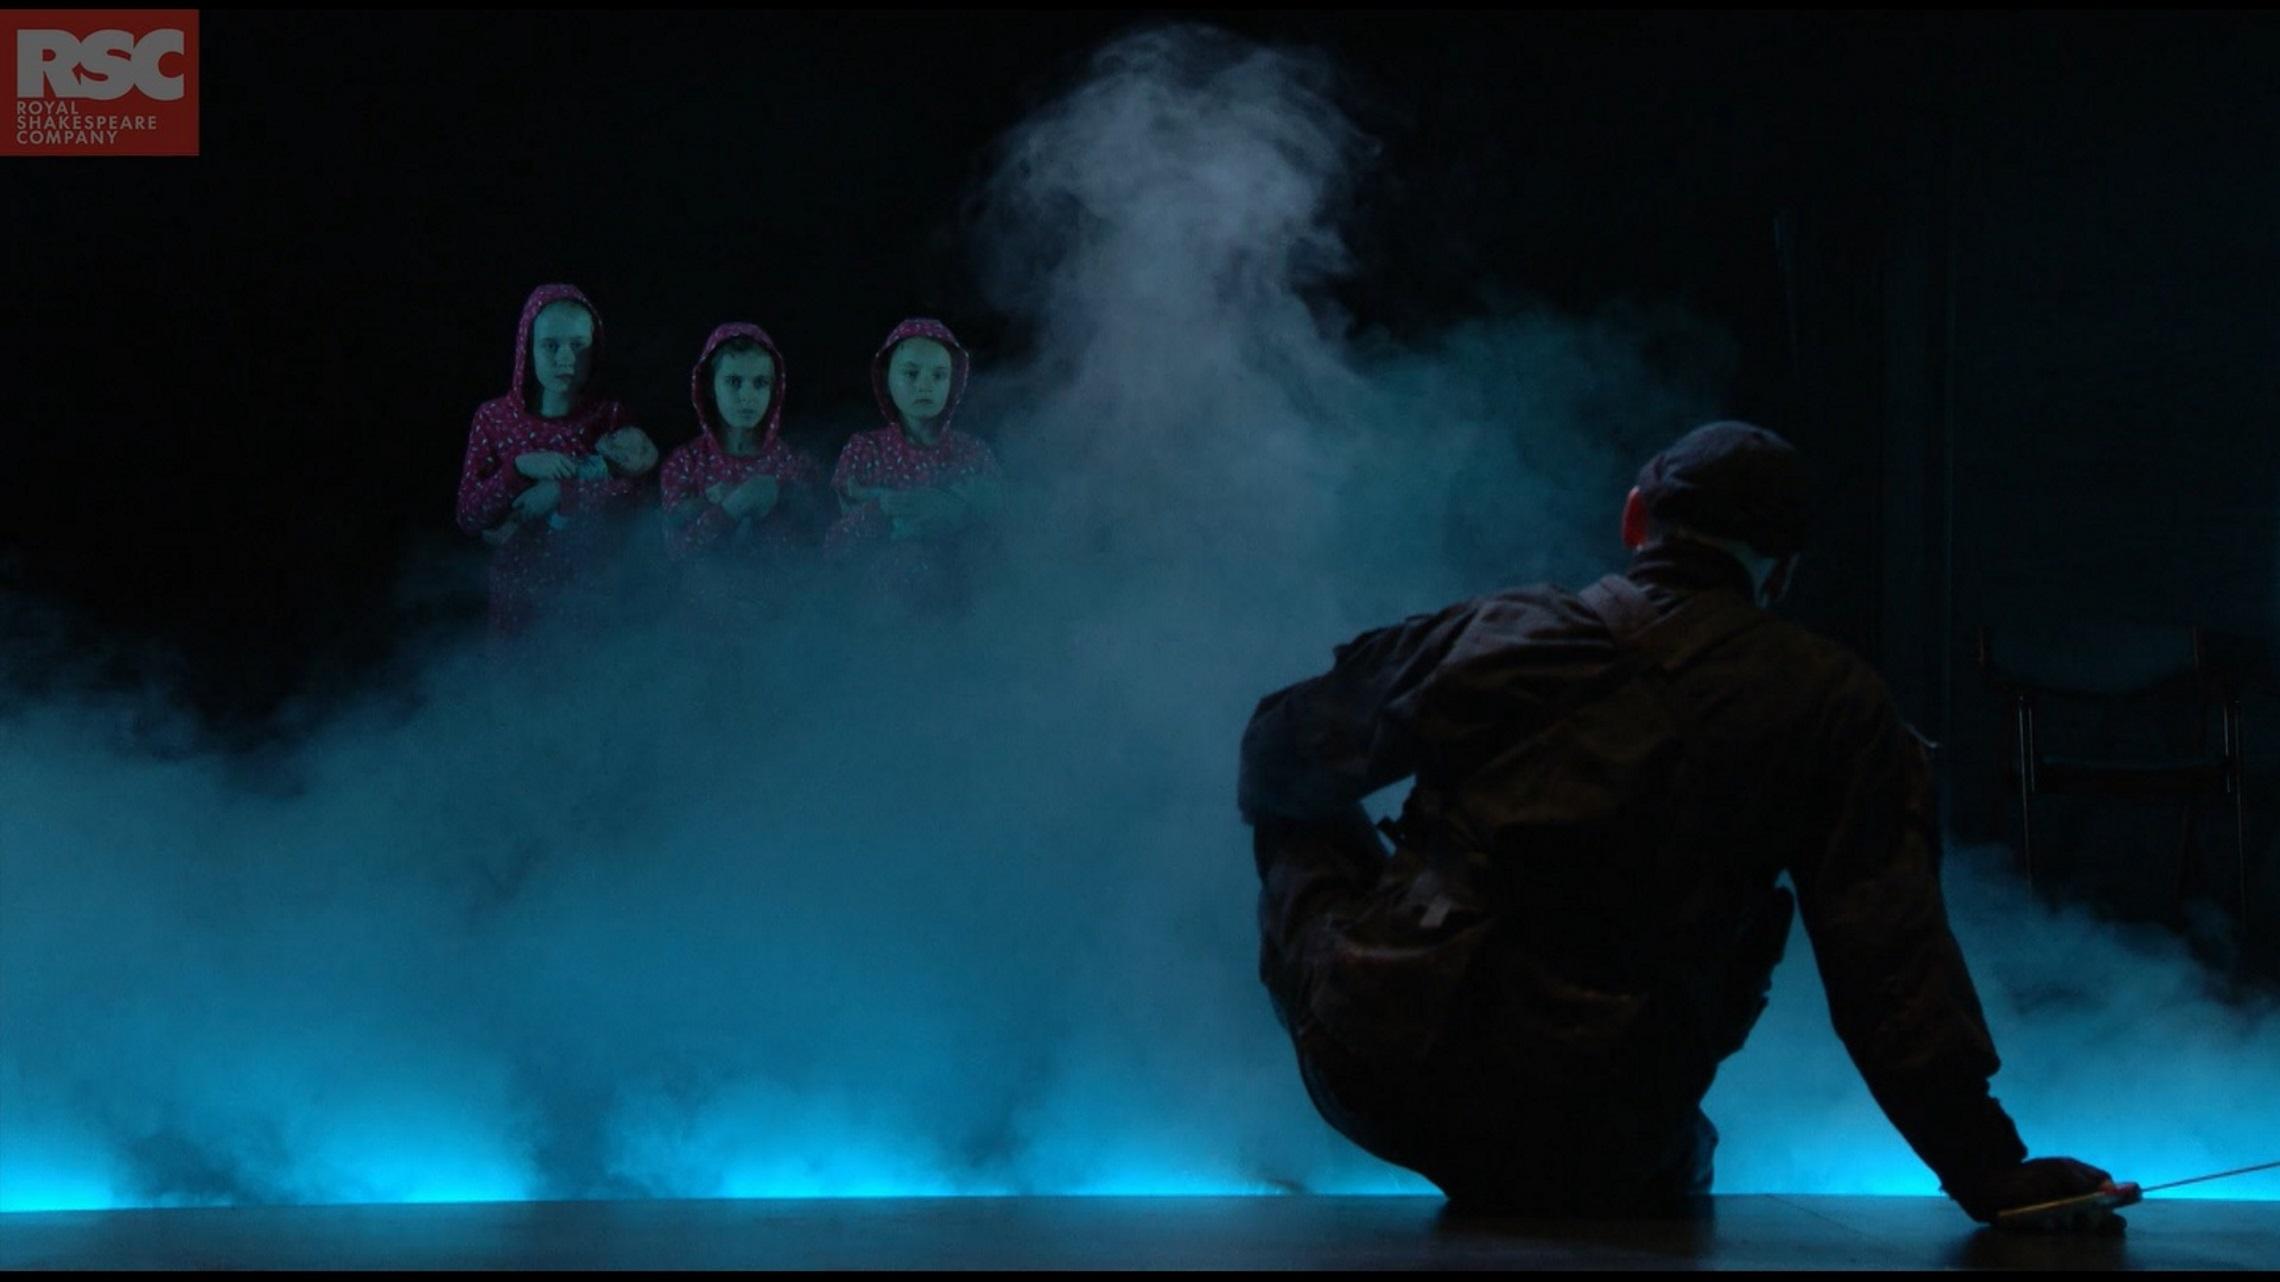 Macbeth Act 1 Scene 3 | Shakespeare Learning Zone